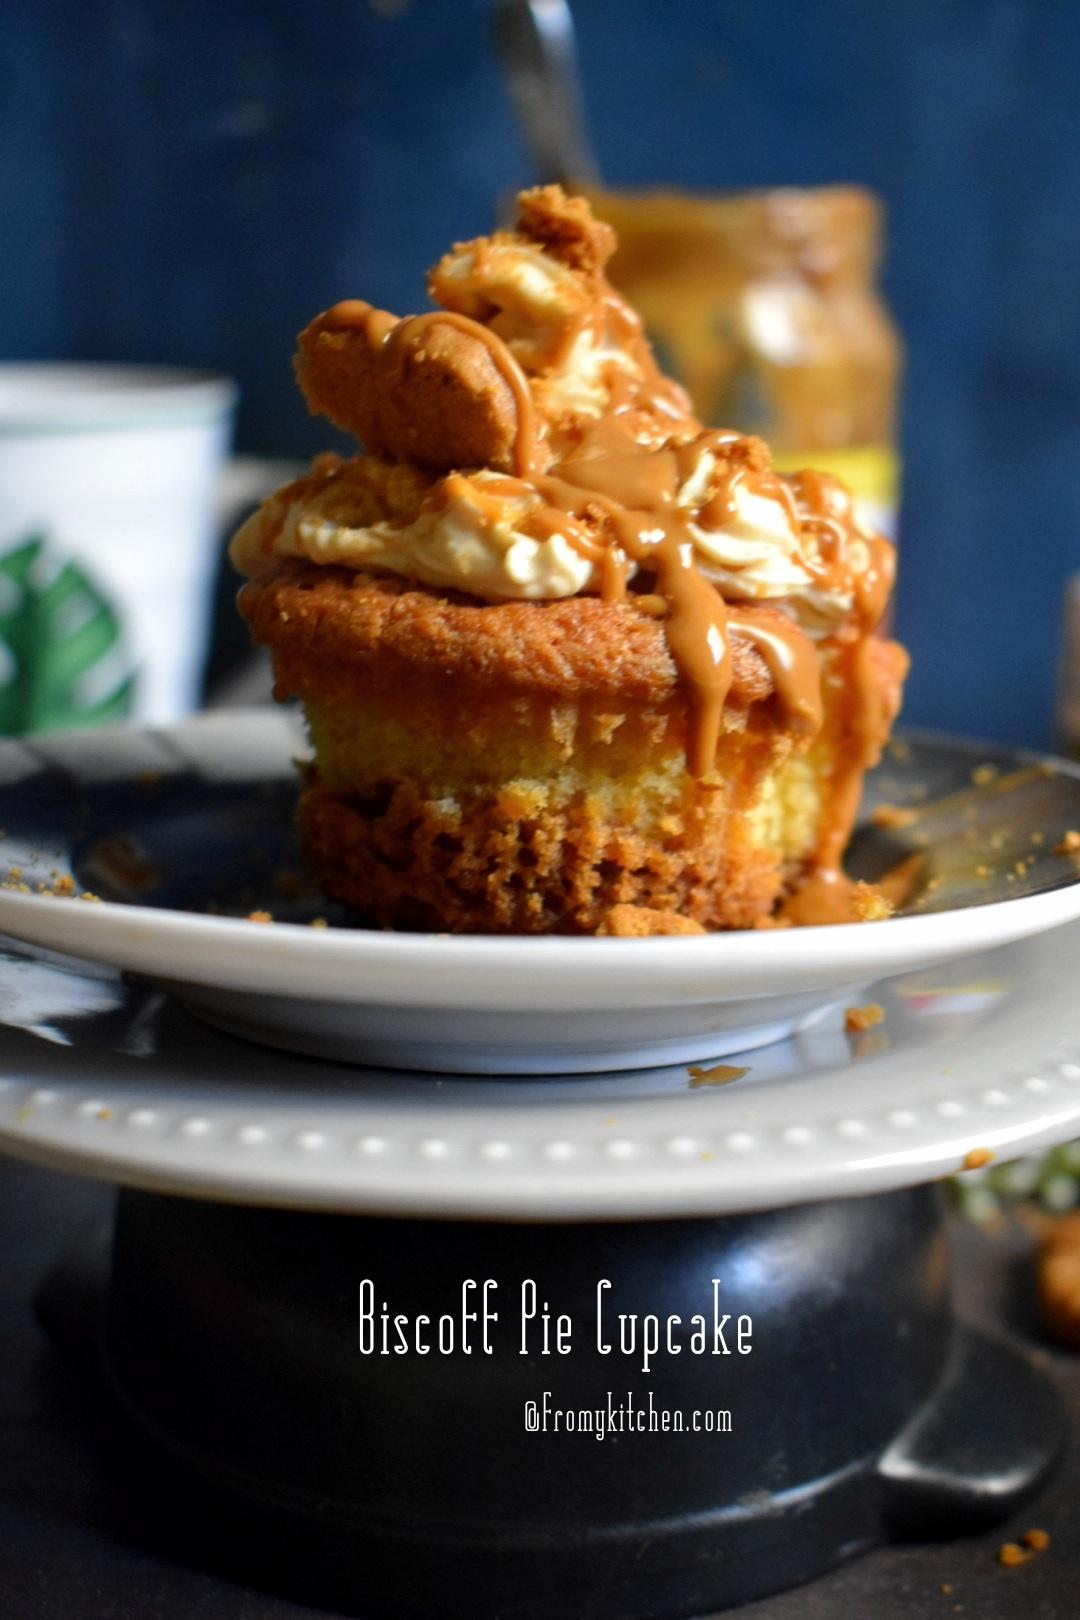 Biscoff Pie Cupcake